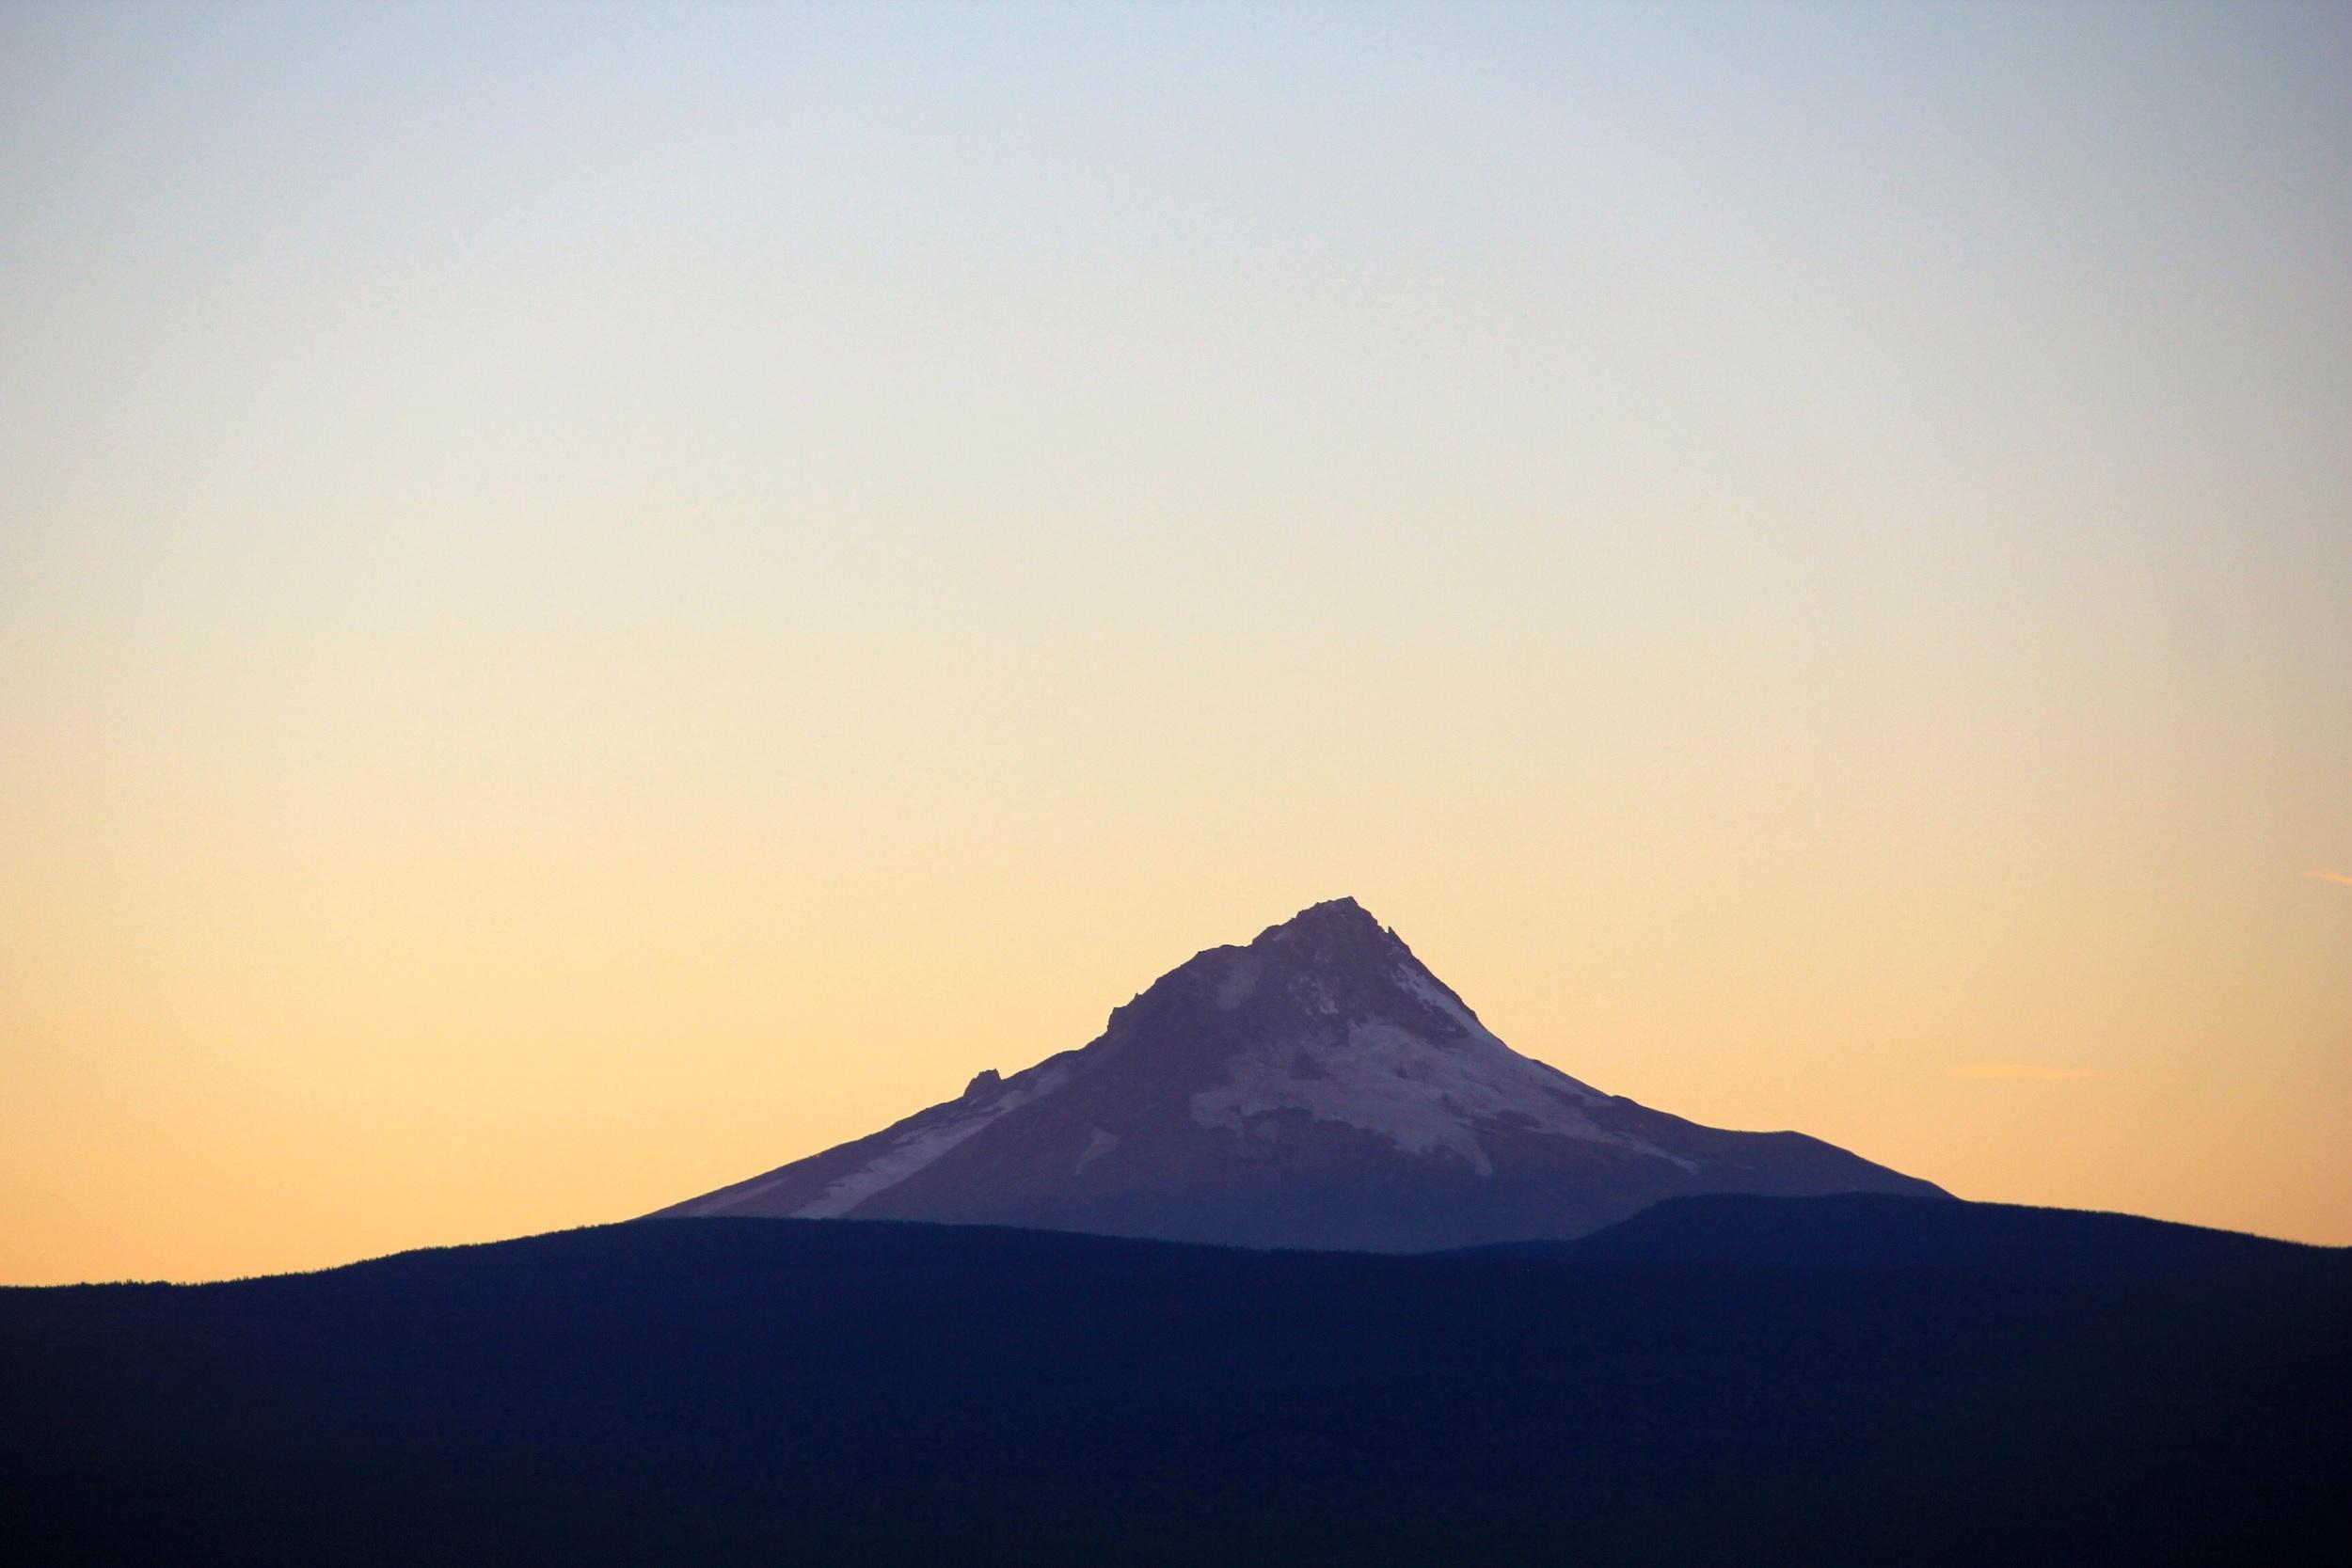 Mount Hood illuminated by the setting sun.